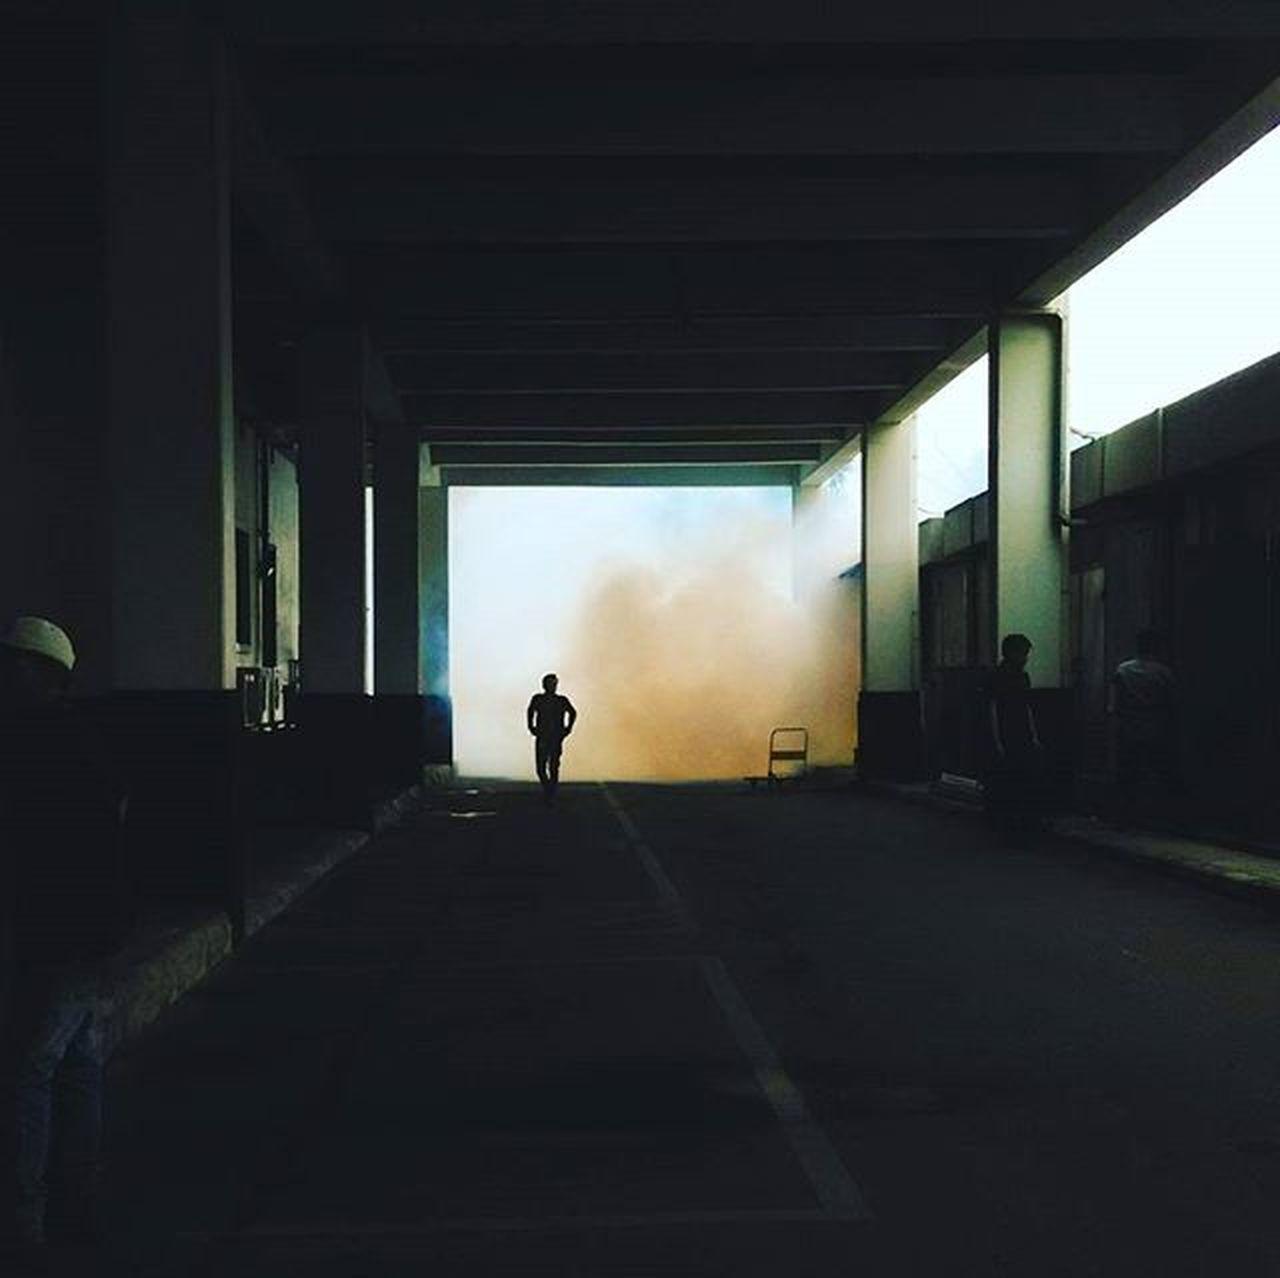 Dark Invasion Invasion Show Case: Febrary Urbanshot Fog Morningshot Silhouettes Suddenlyshot Streetphotography Lighandshadow